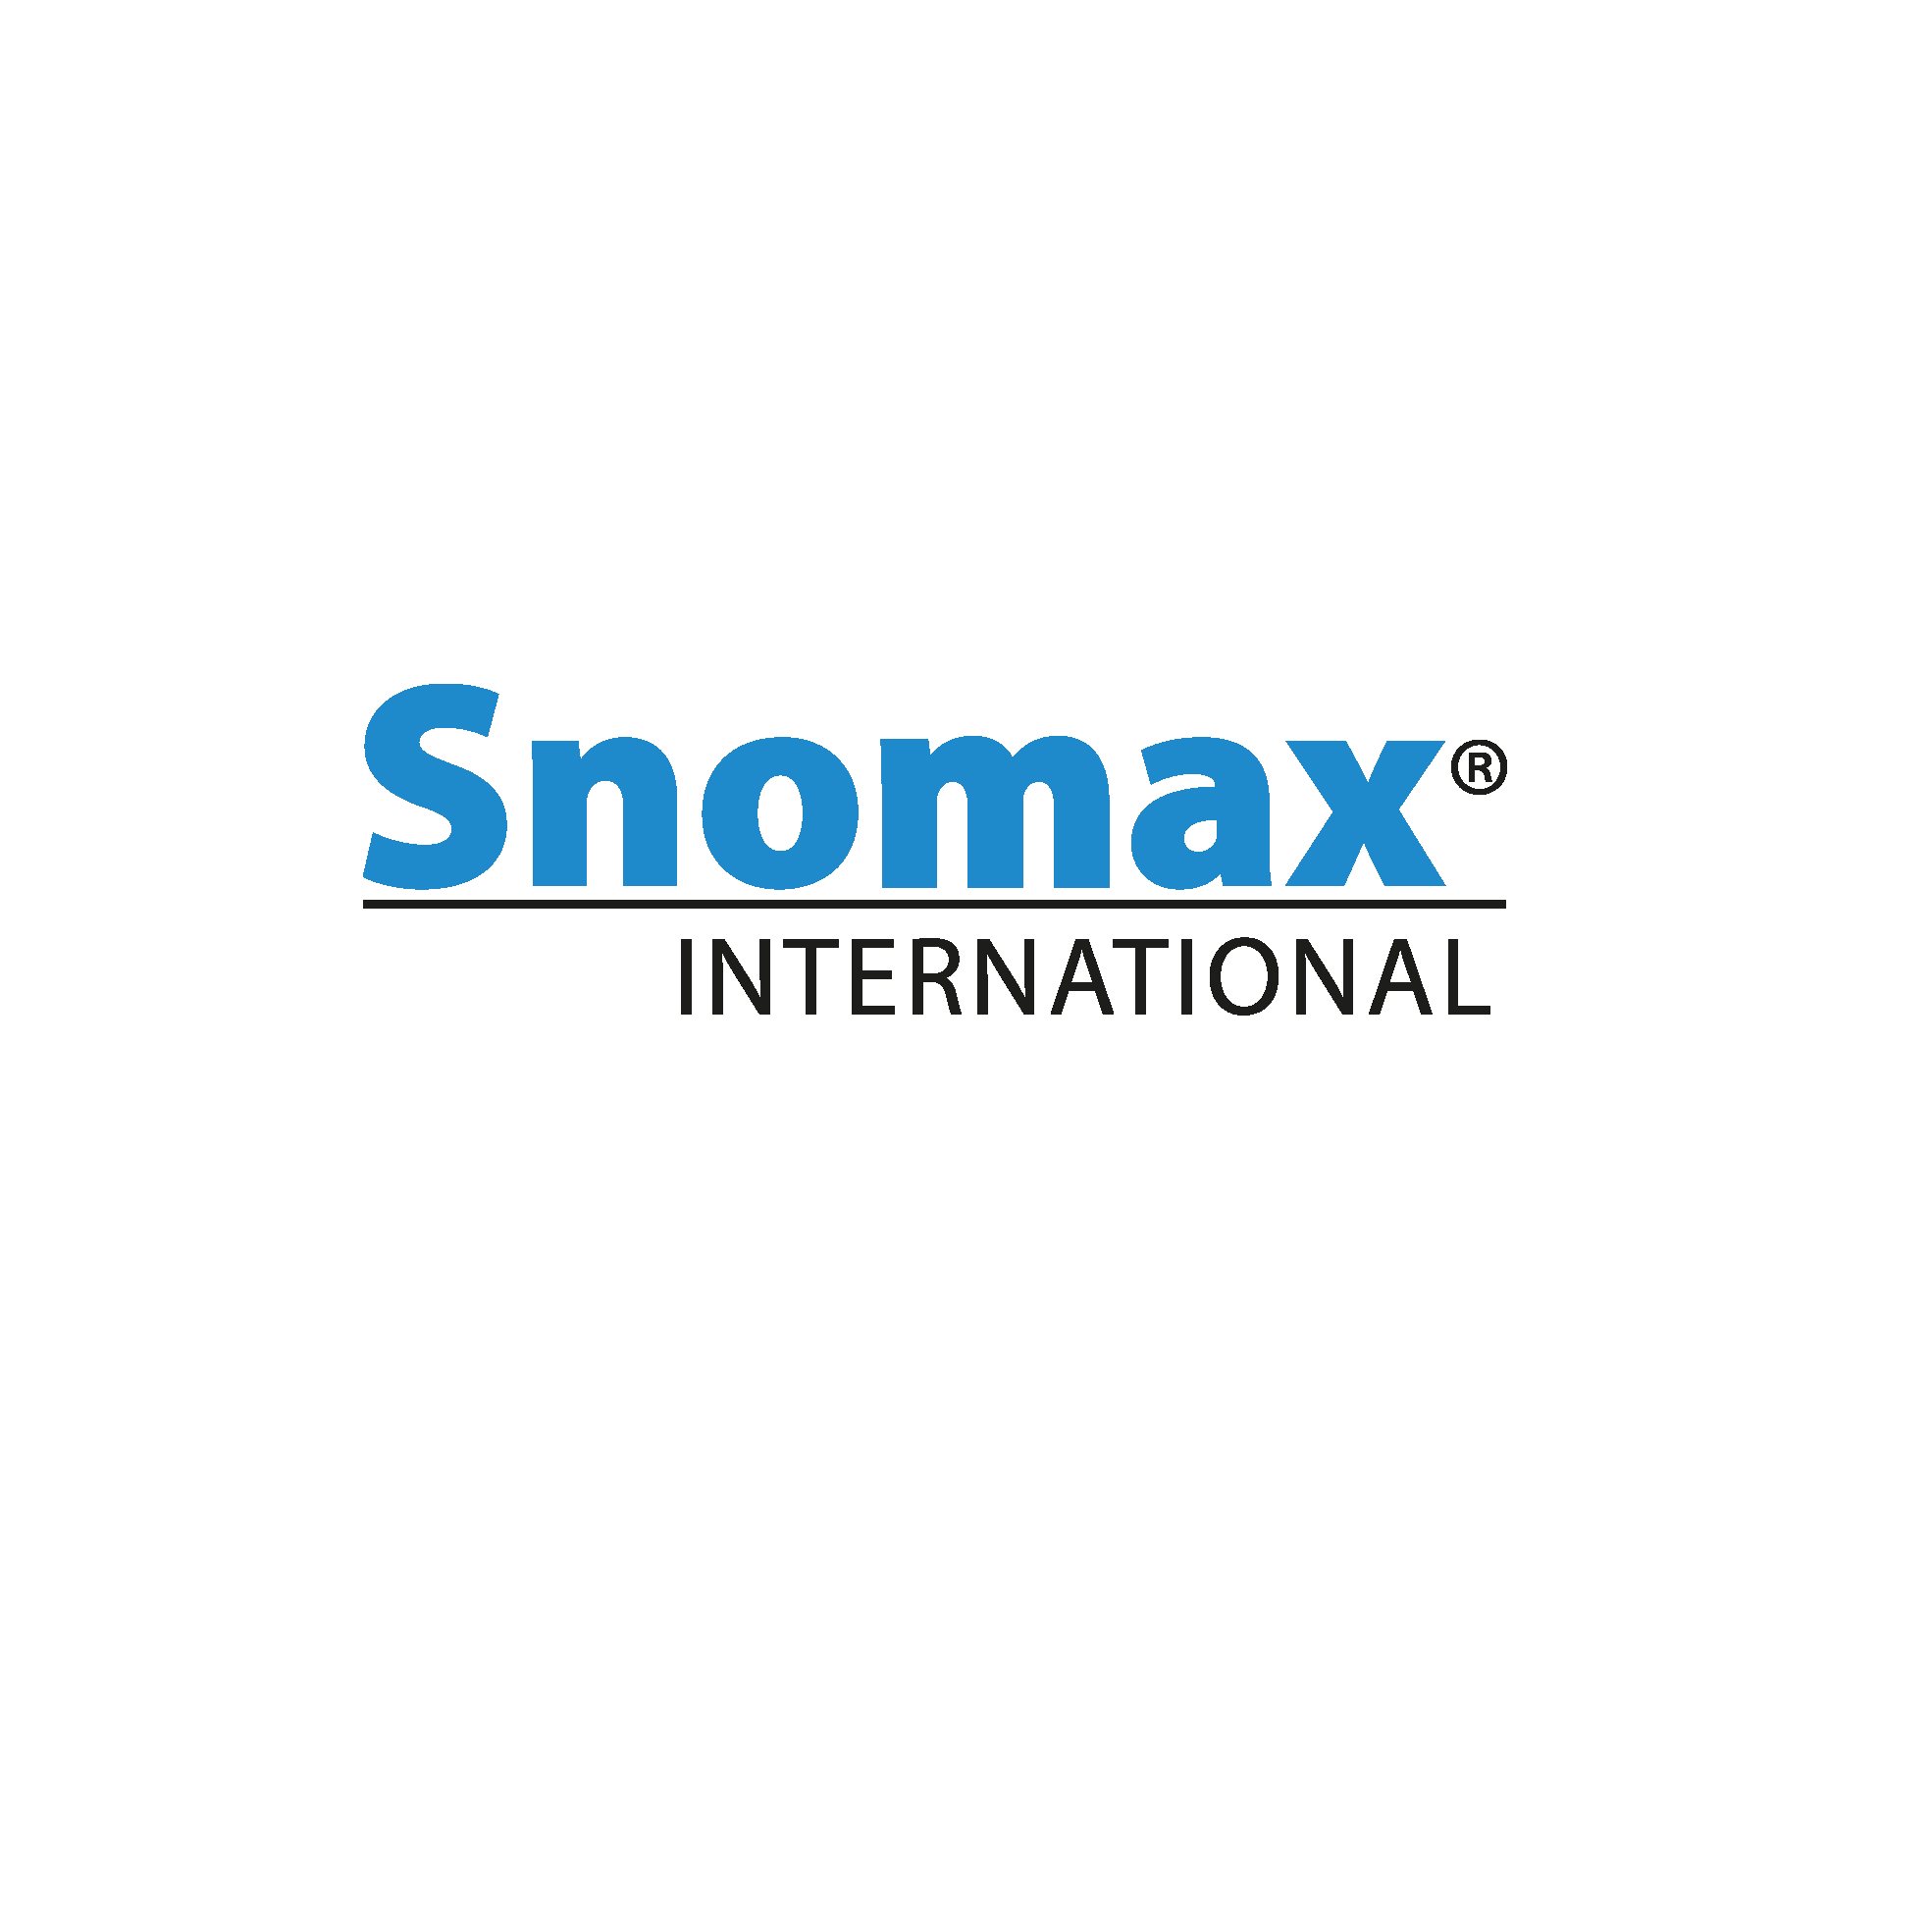 Snomax logo - Pantone 286 blue